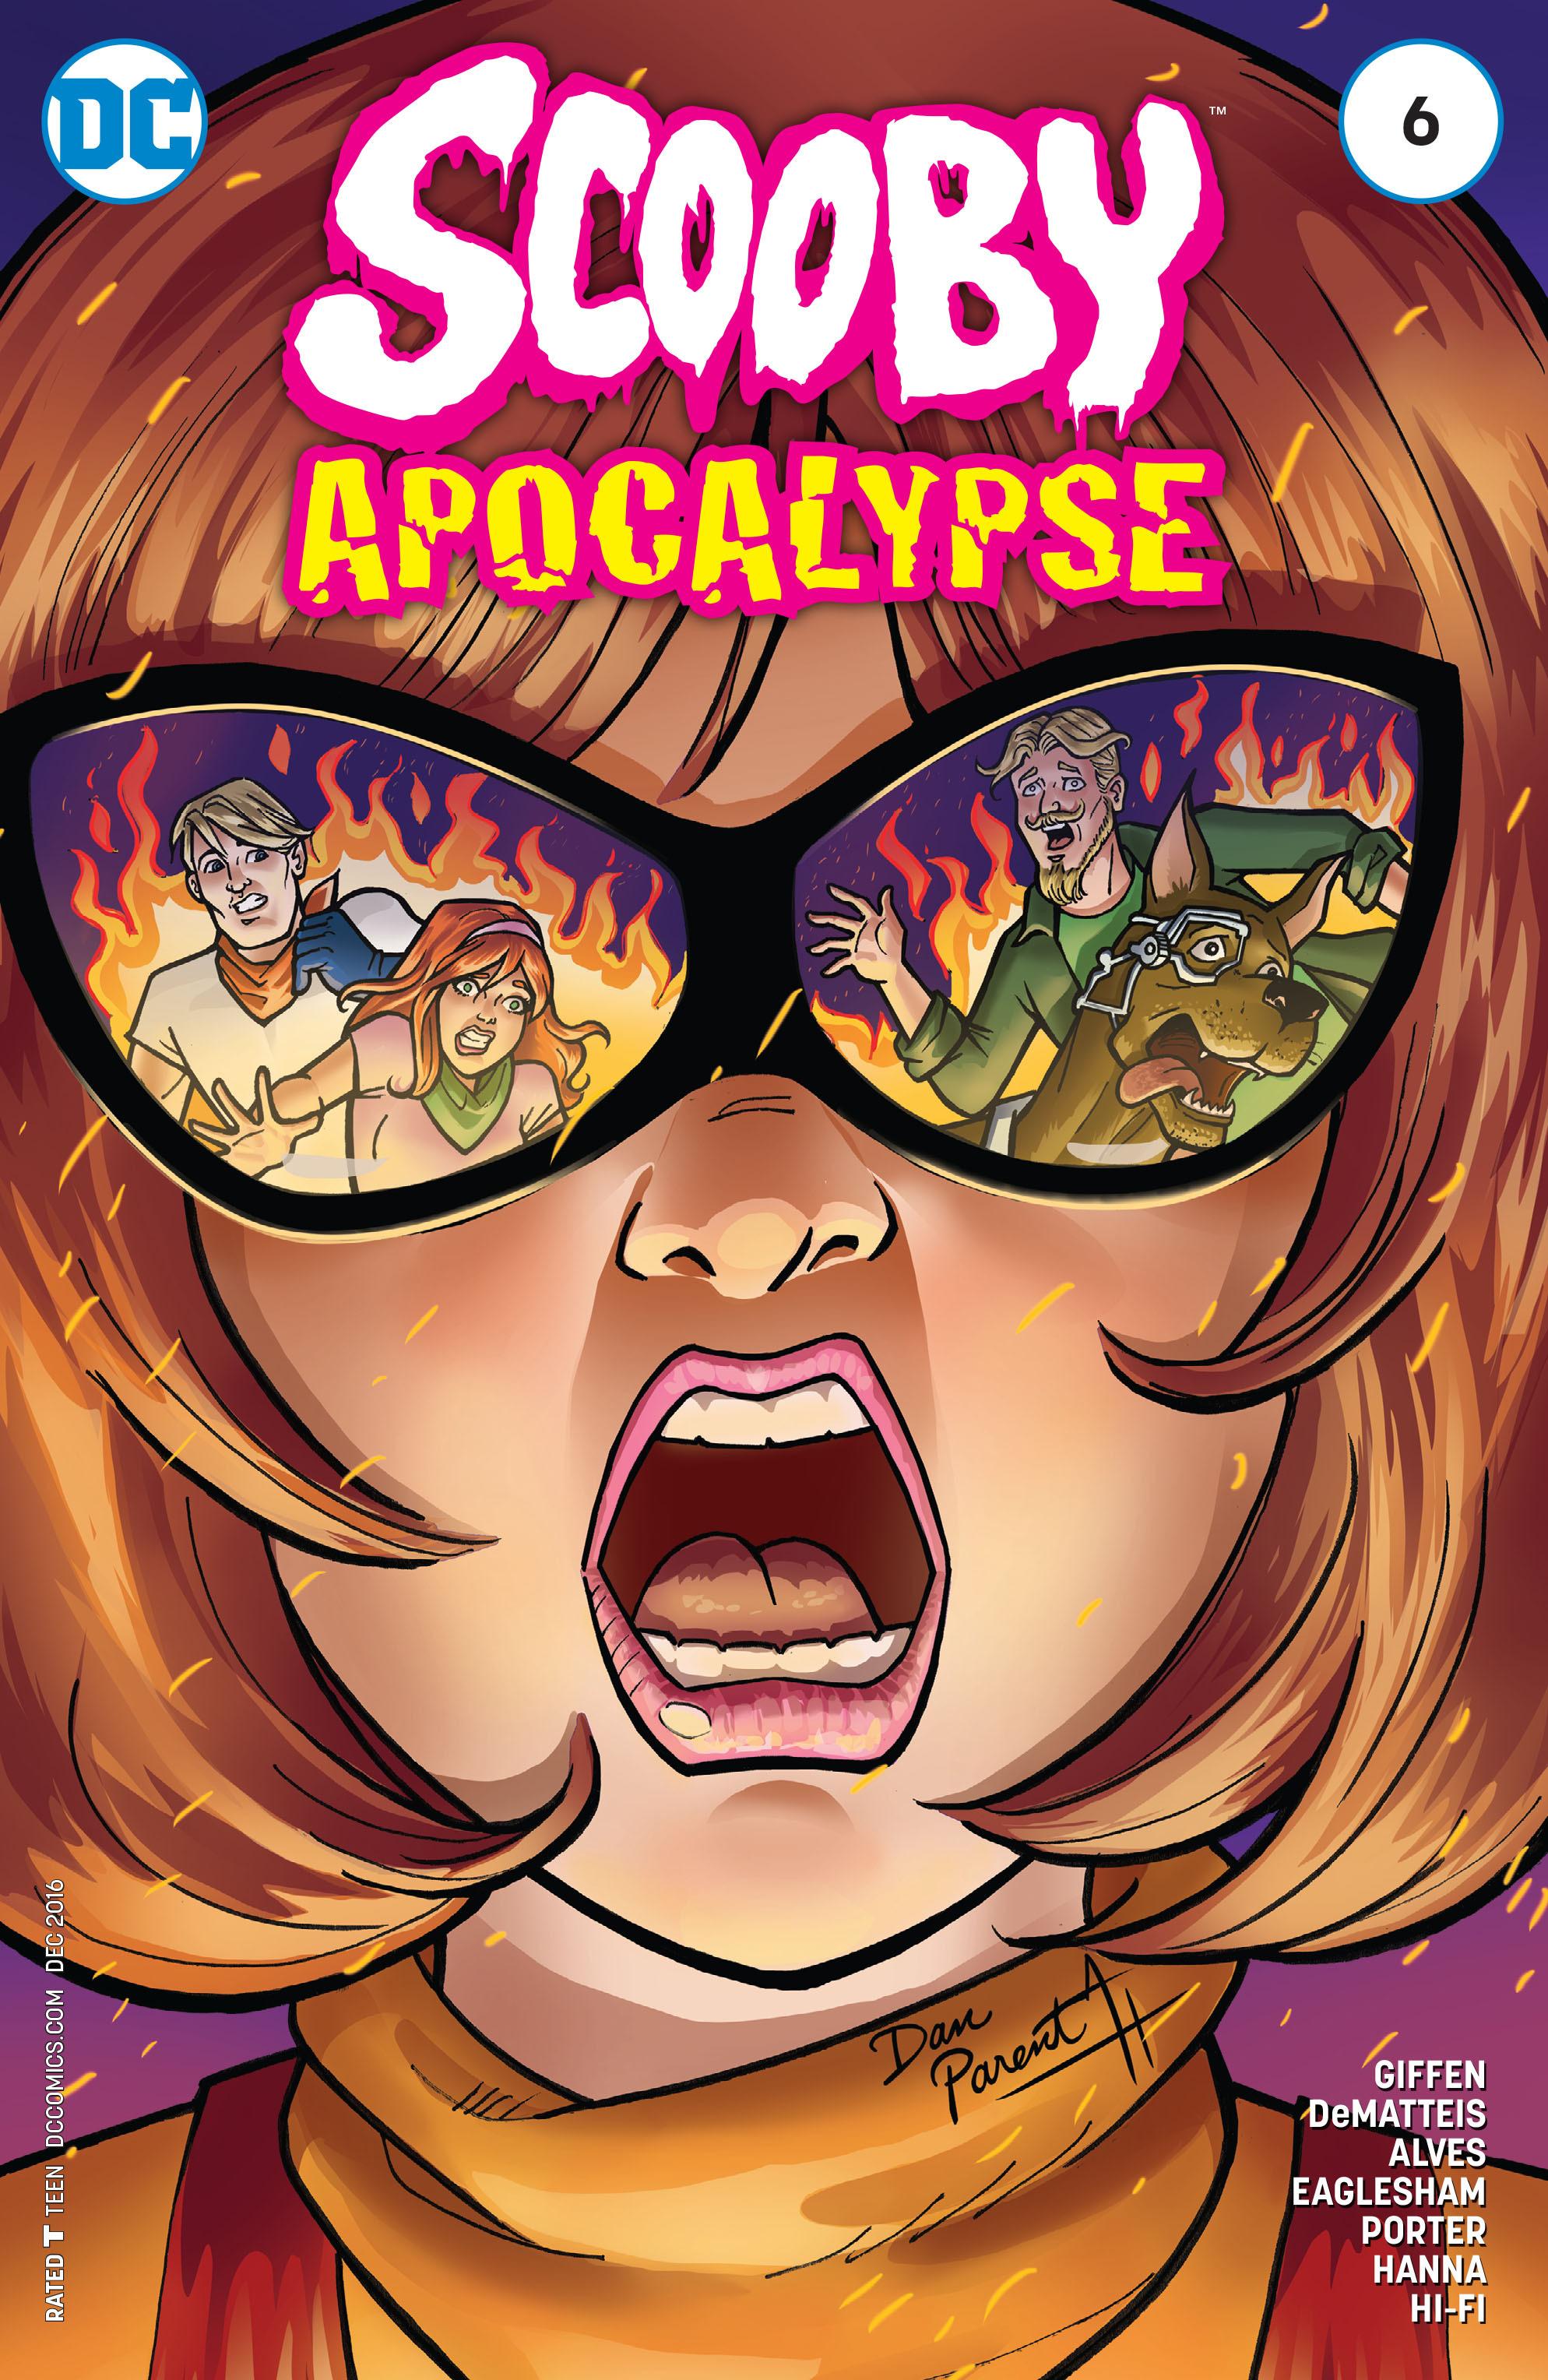 Read online Scooby Apocalypse comic -  Issue #6 - 3